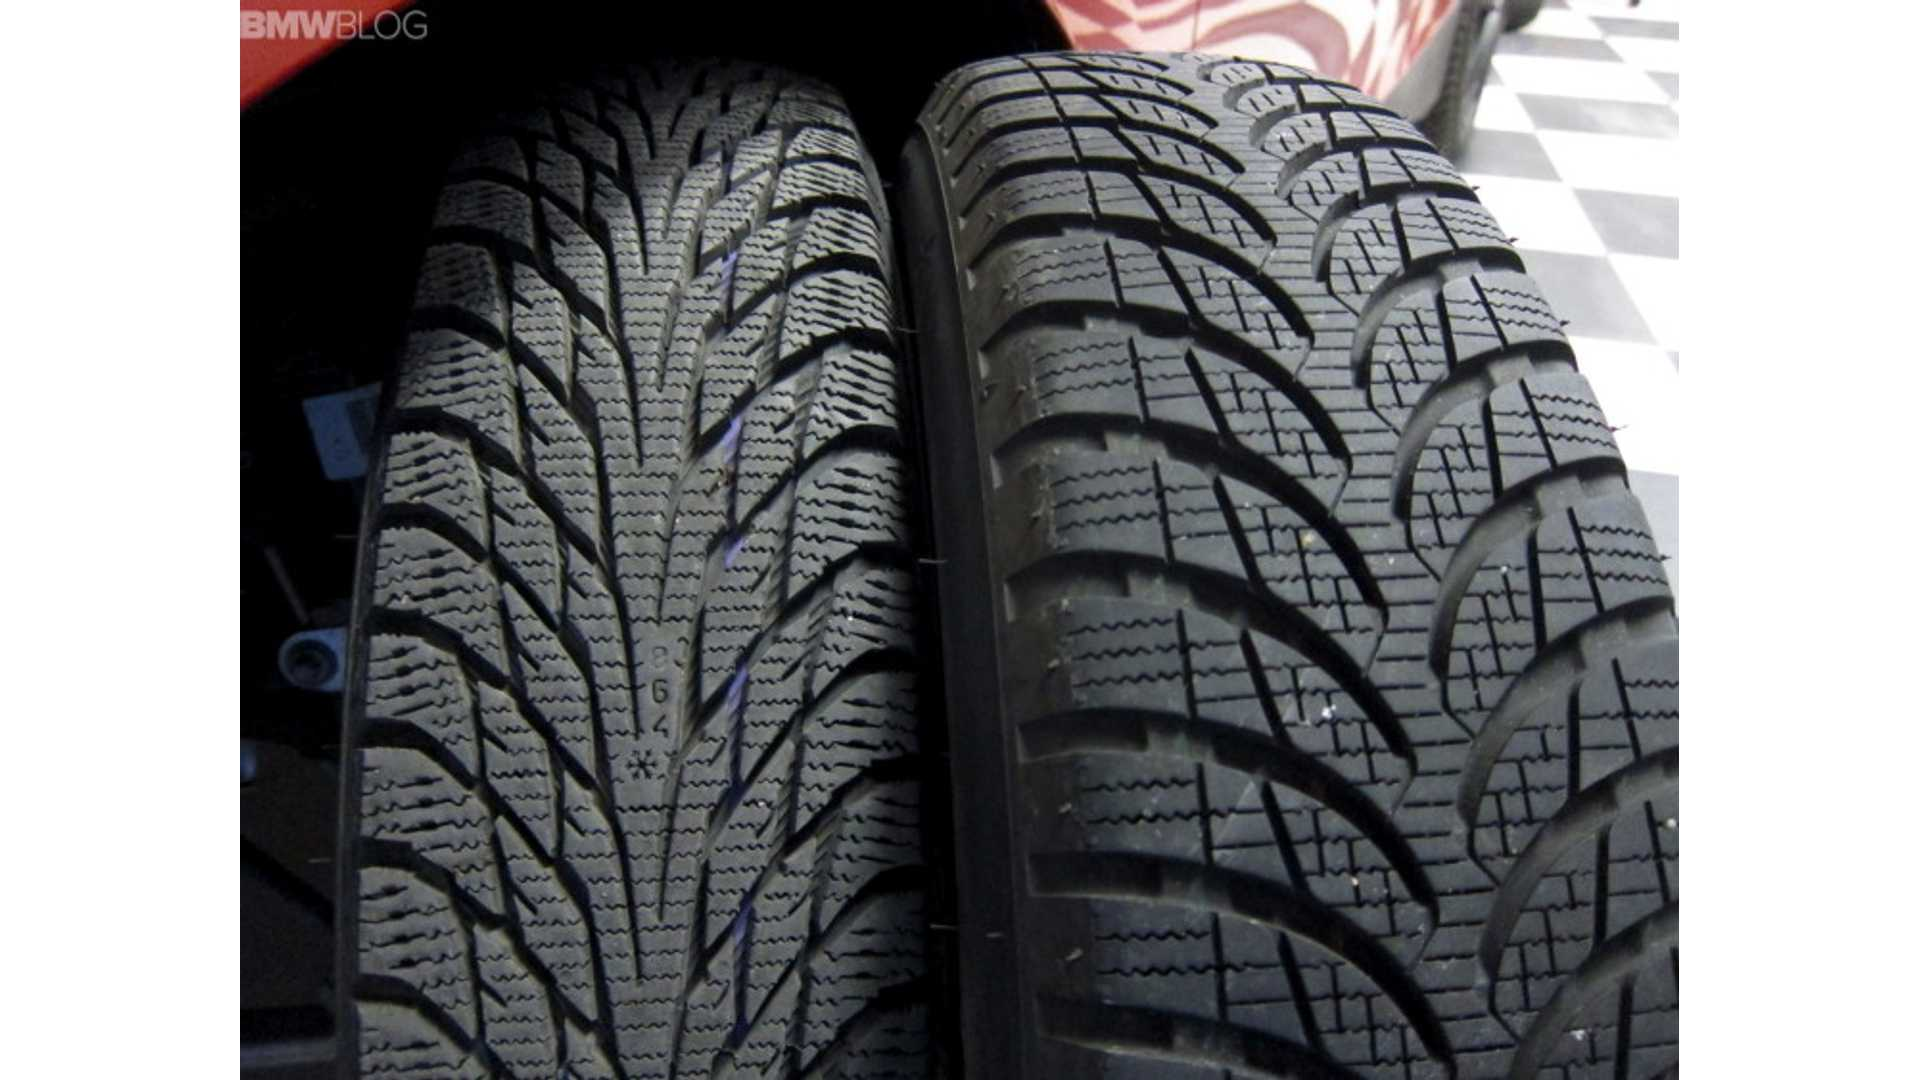 Bmw I3 Winter Tire Review Bridgestone Blizzak Lm 500 Vs Nokian Hpeliitta R2